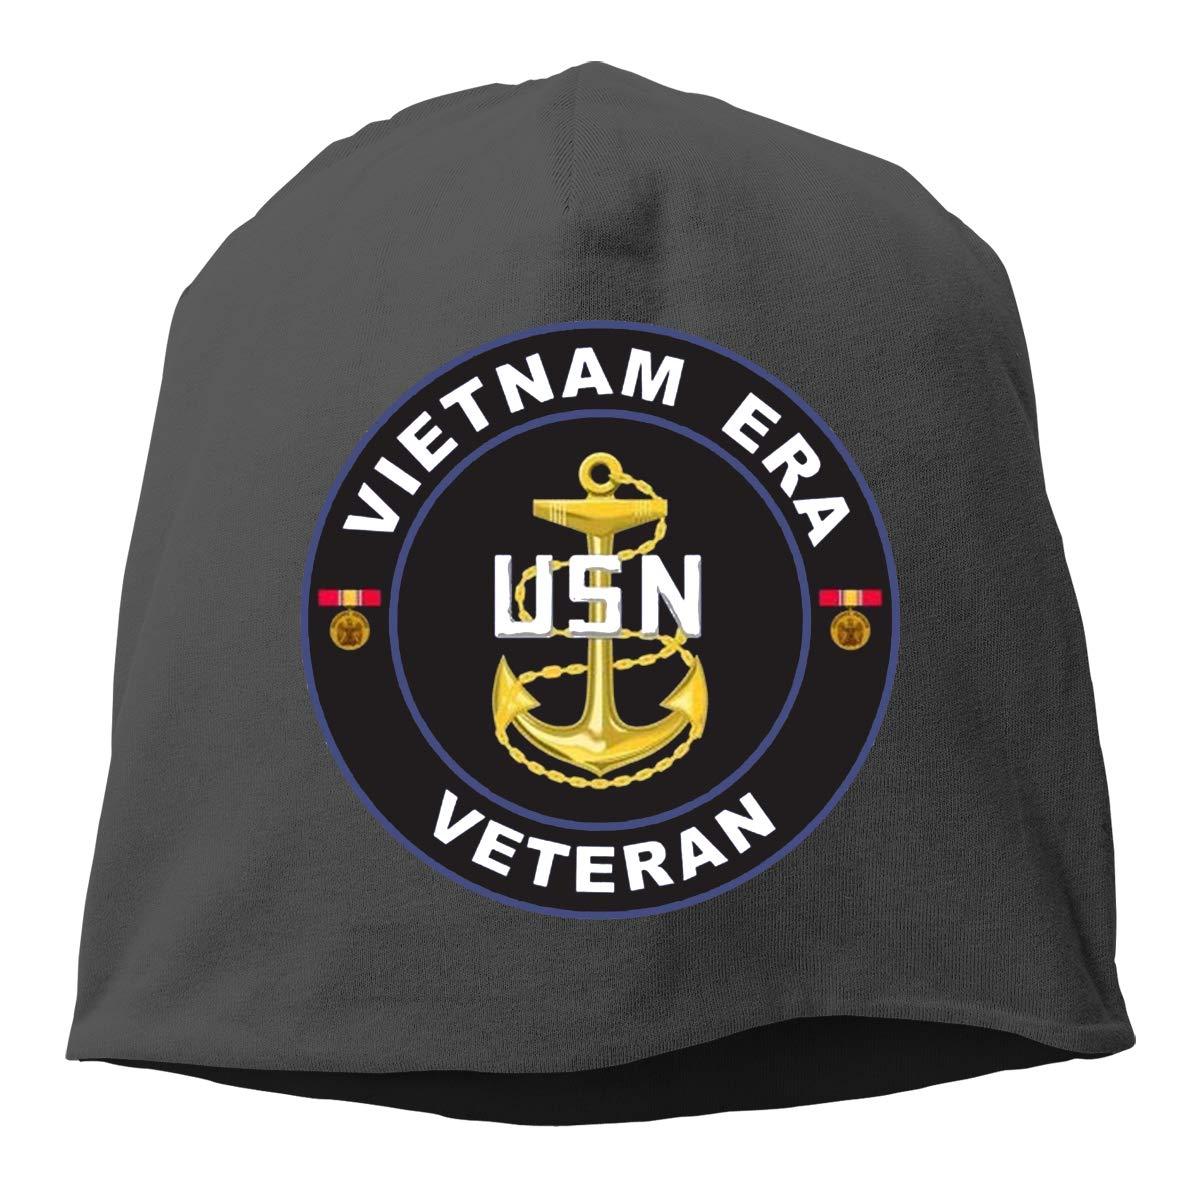 United States Navy Vietnam Era Veteran Hedging Hat Unisex Skull Hat Knitted Hat Beanie Cap for Autumn//Winter Cap